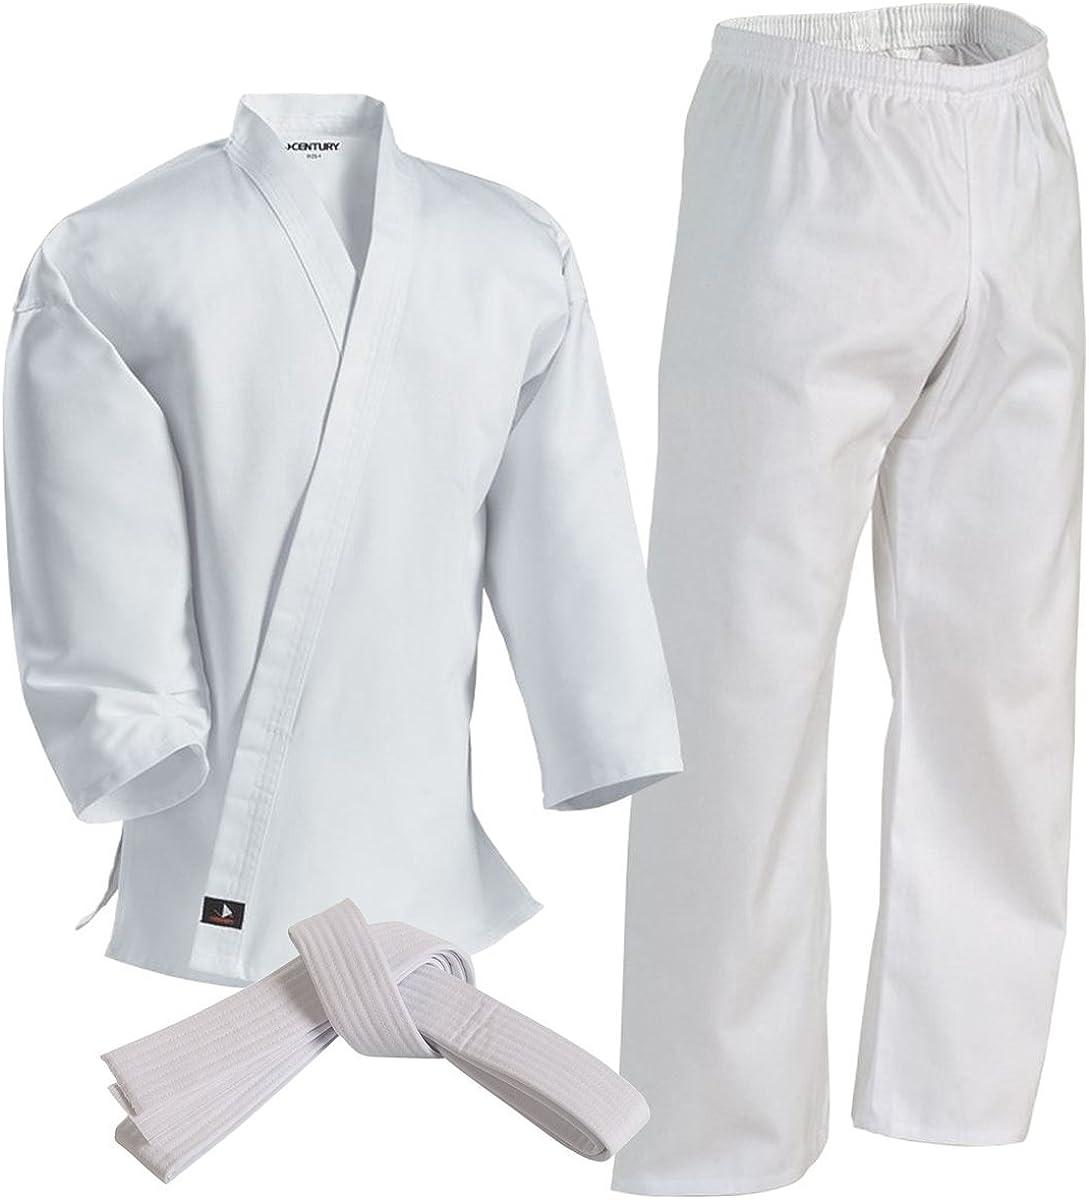 Century Martial Arts Discount mail order 6 oz. Karate Lightweight Stude Ranking TOP12